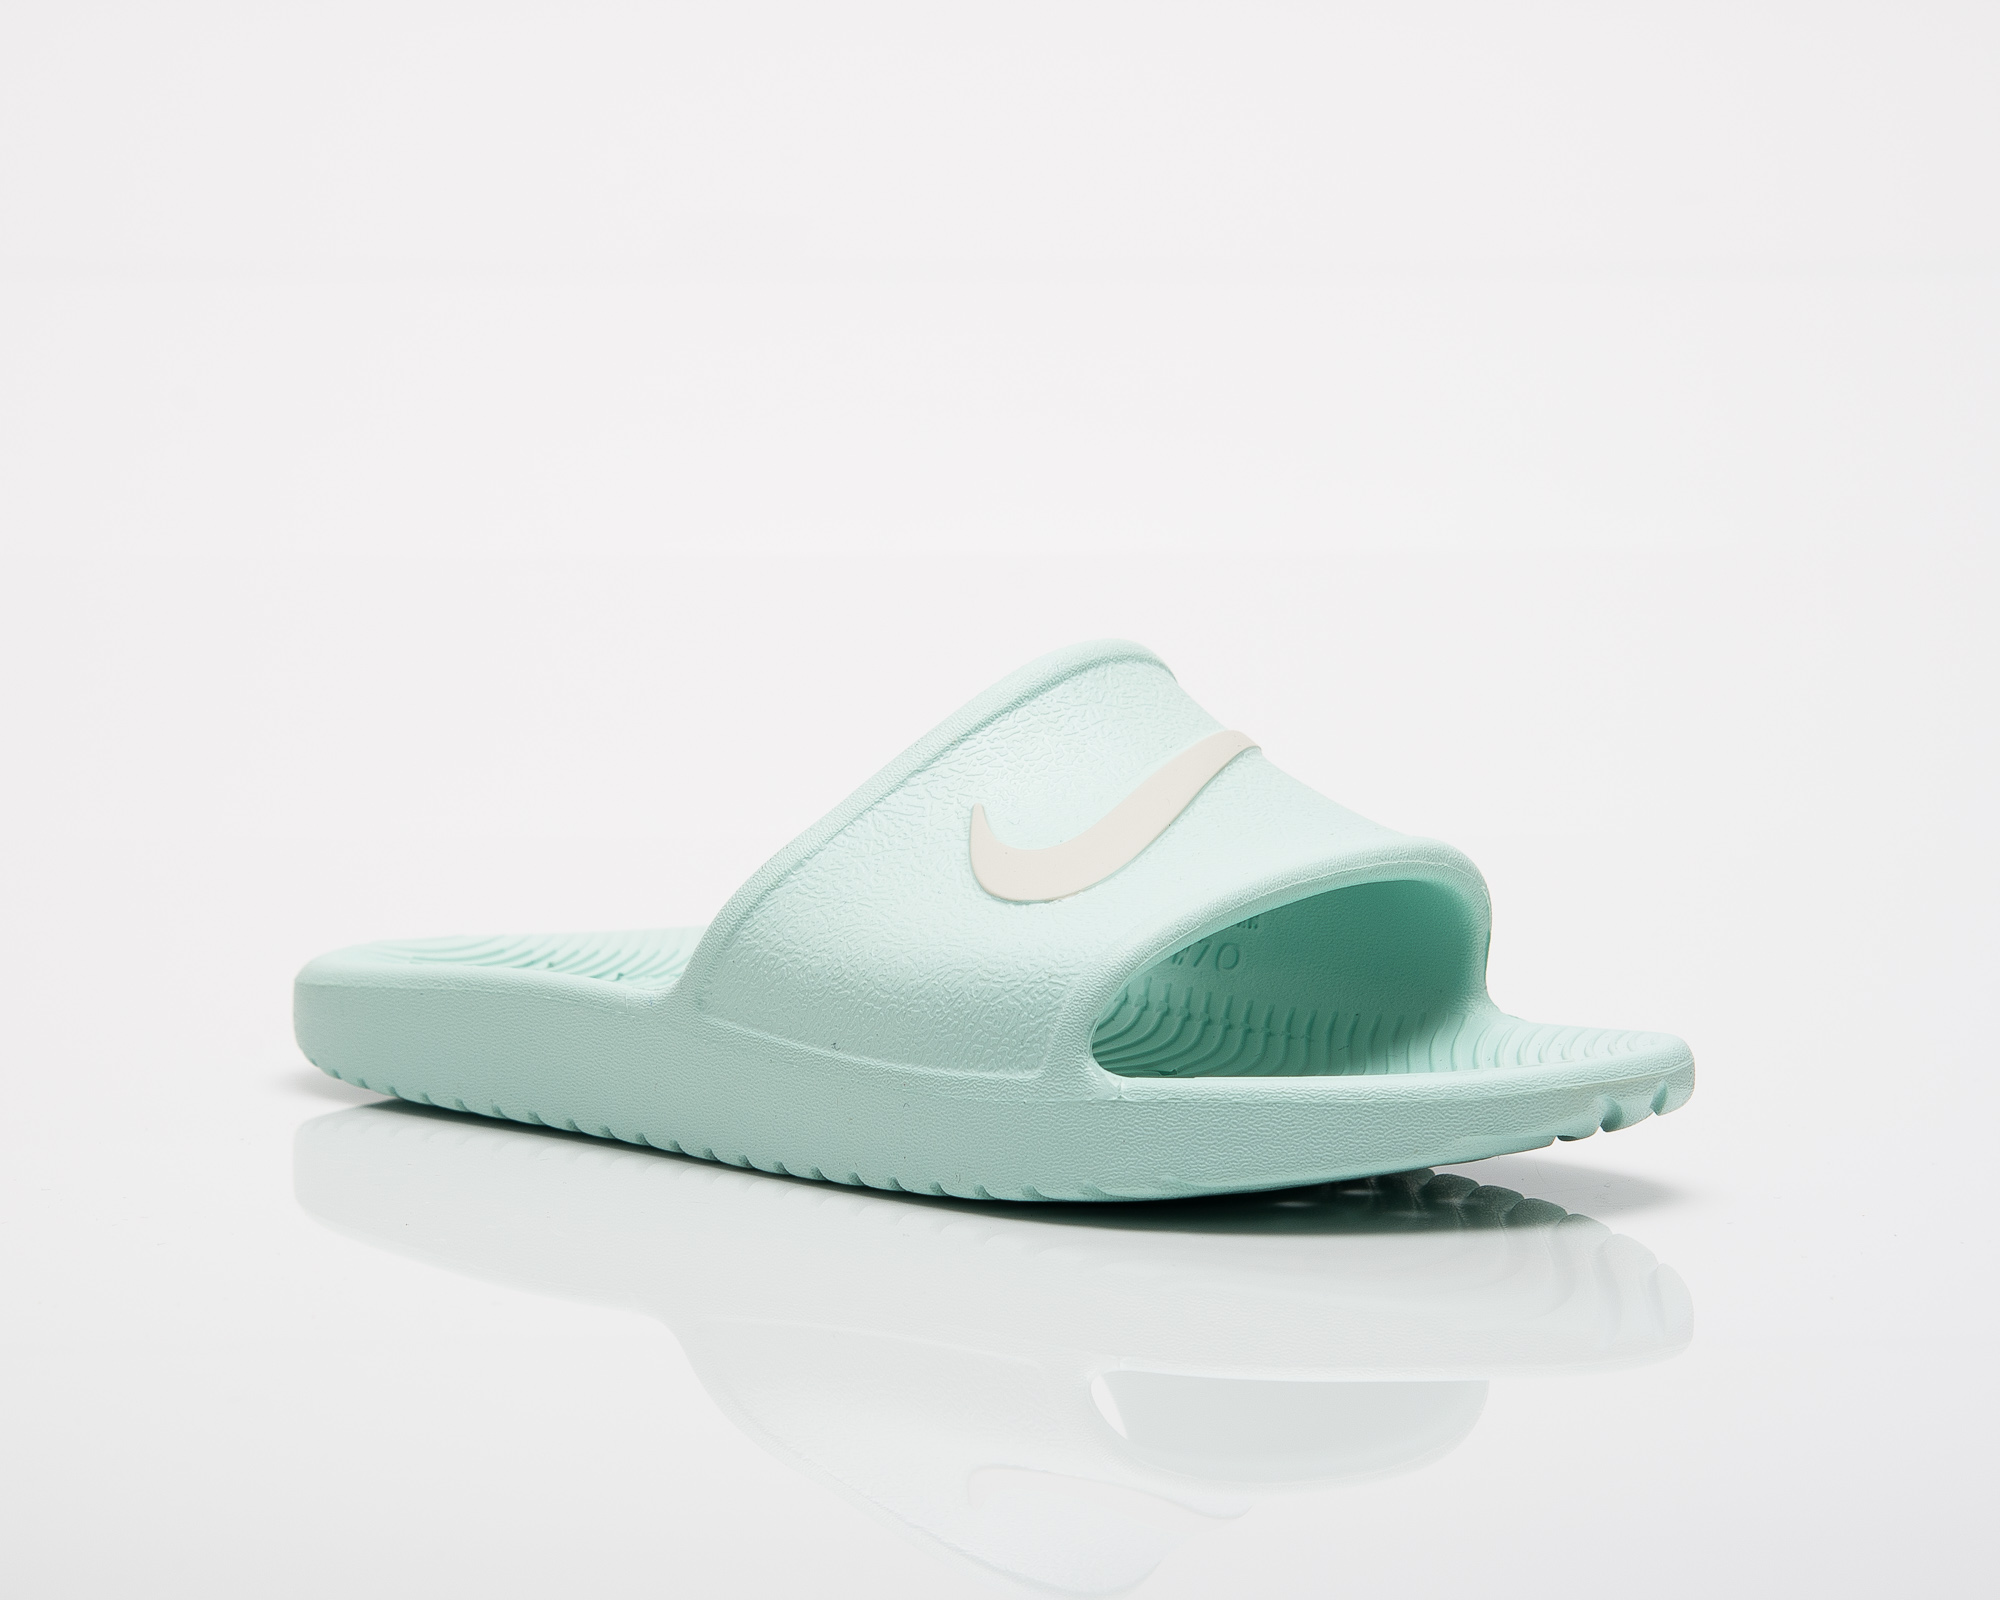 826c65a5fd4589 Nike Wmns Kawa Shower Slide - Shoes Slides - Sporting goods